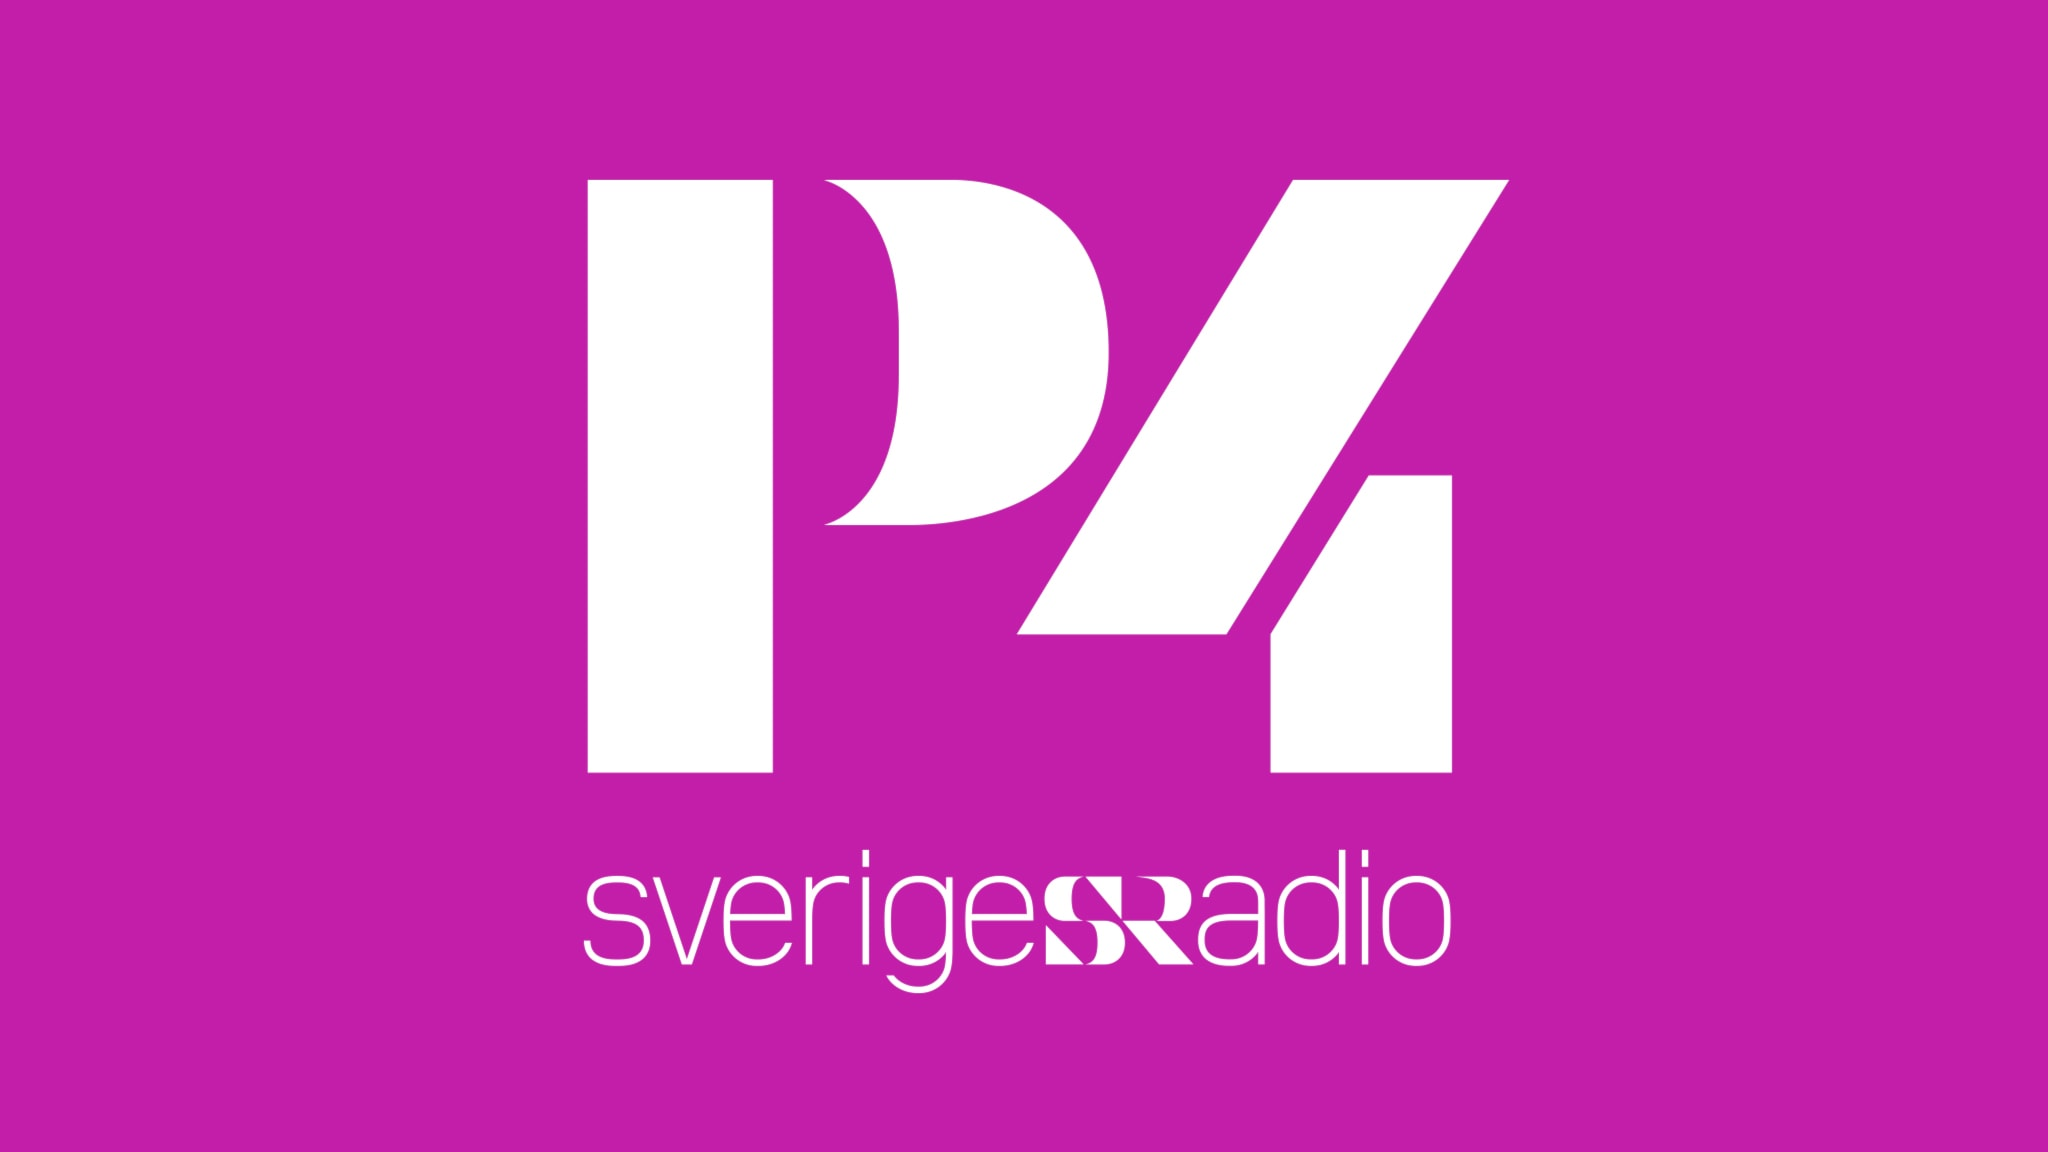 Trafik P4 Göteborg 20180730 08.34 (01.05) - spela